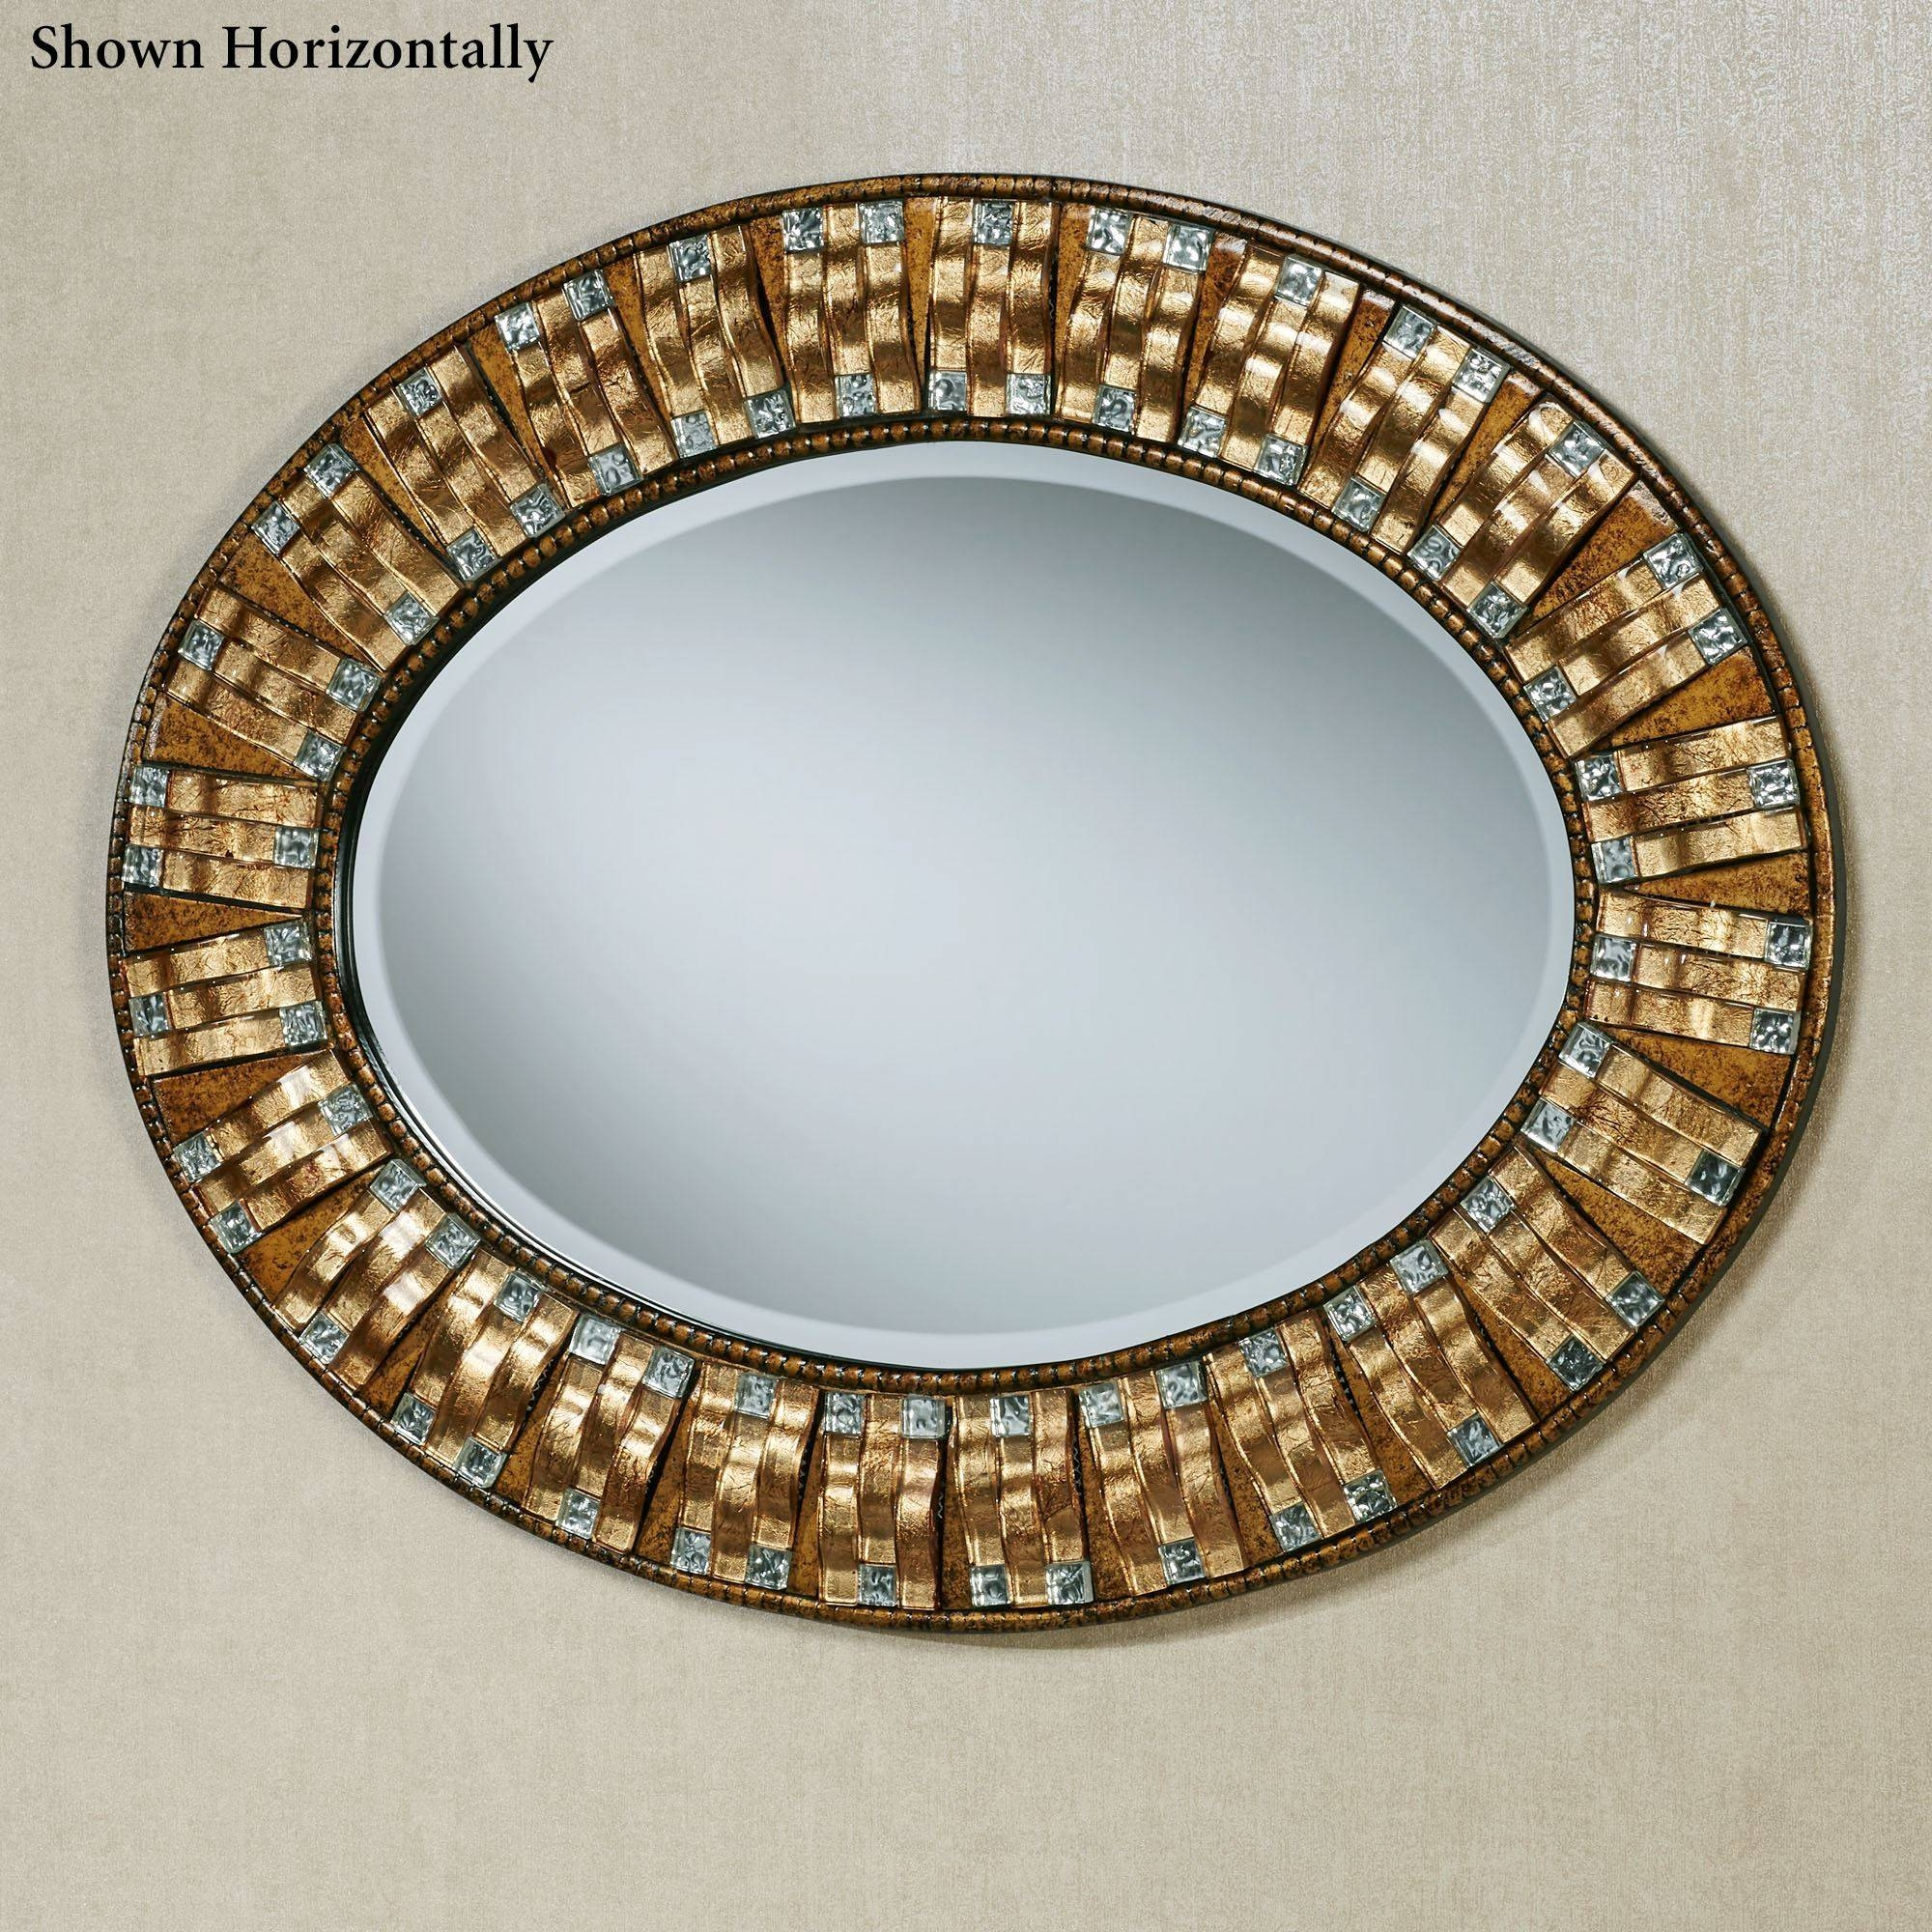 Maybelle Mosaic Oval Wall Mirror regarding Mosaic Wall Mirrors (Image 13 of 25)